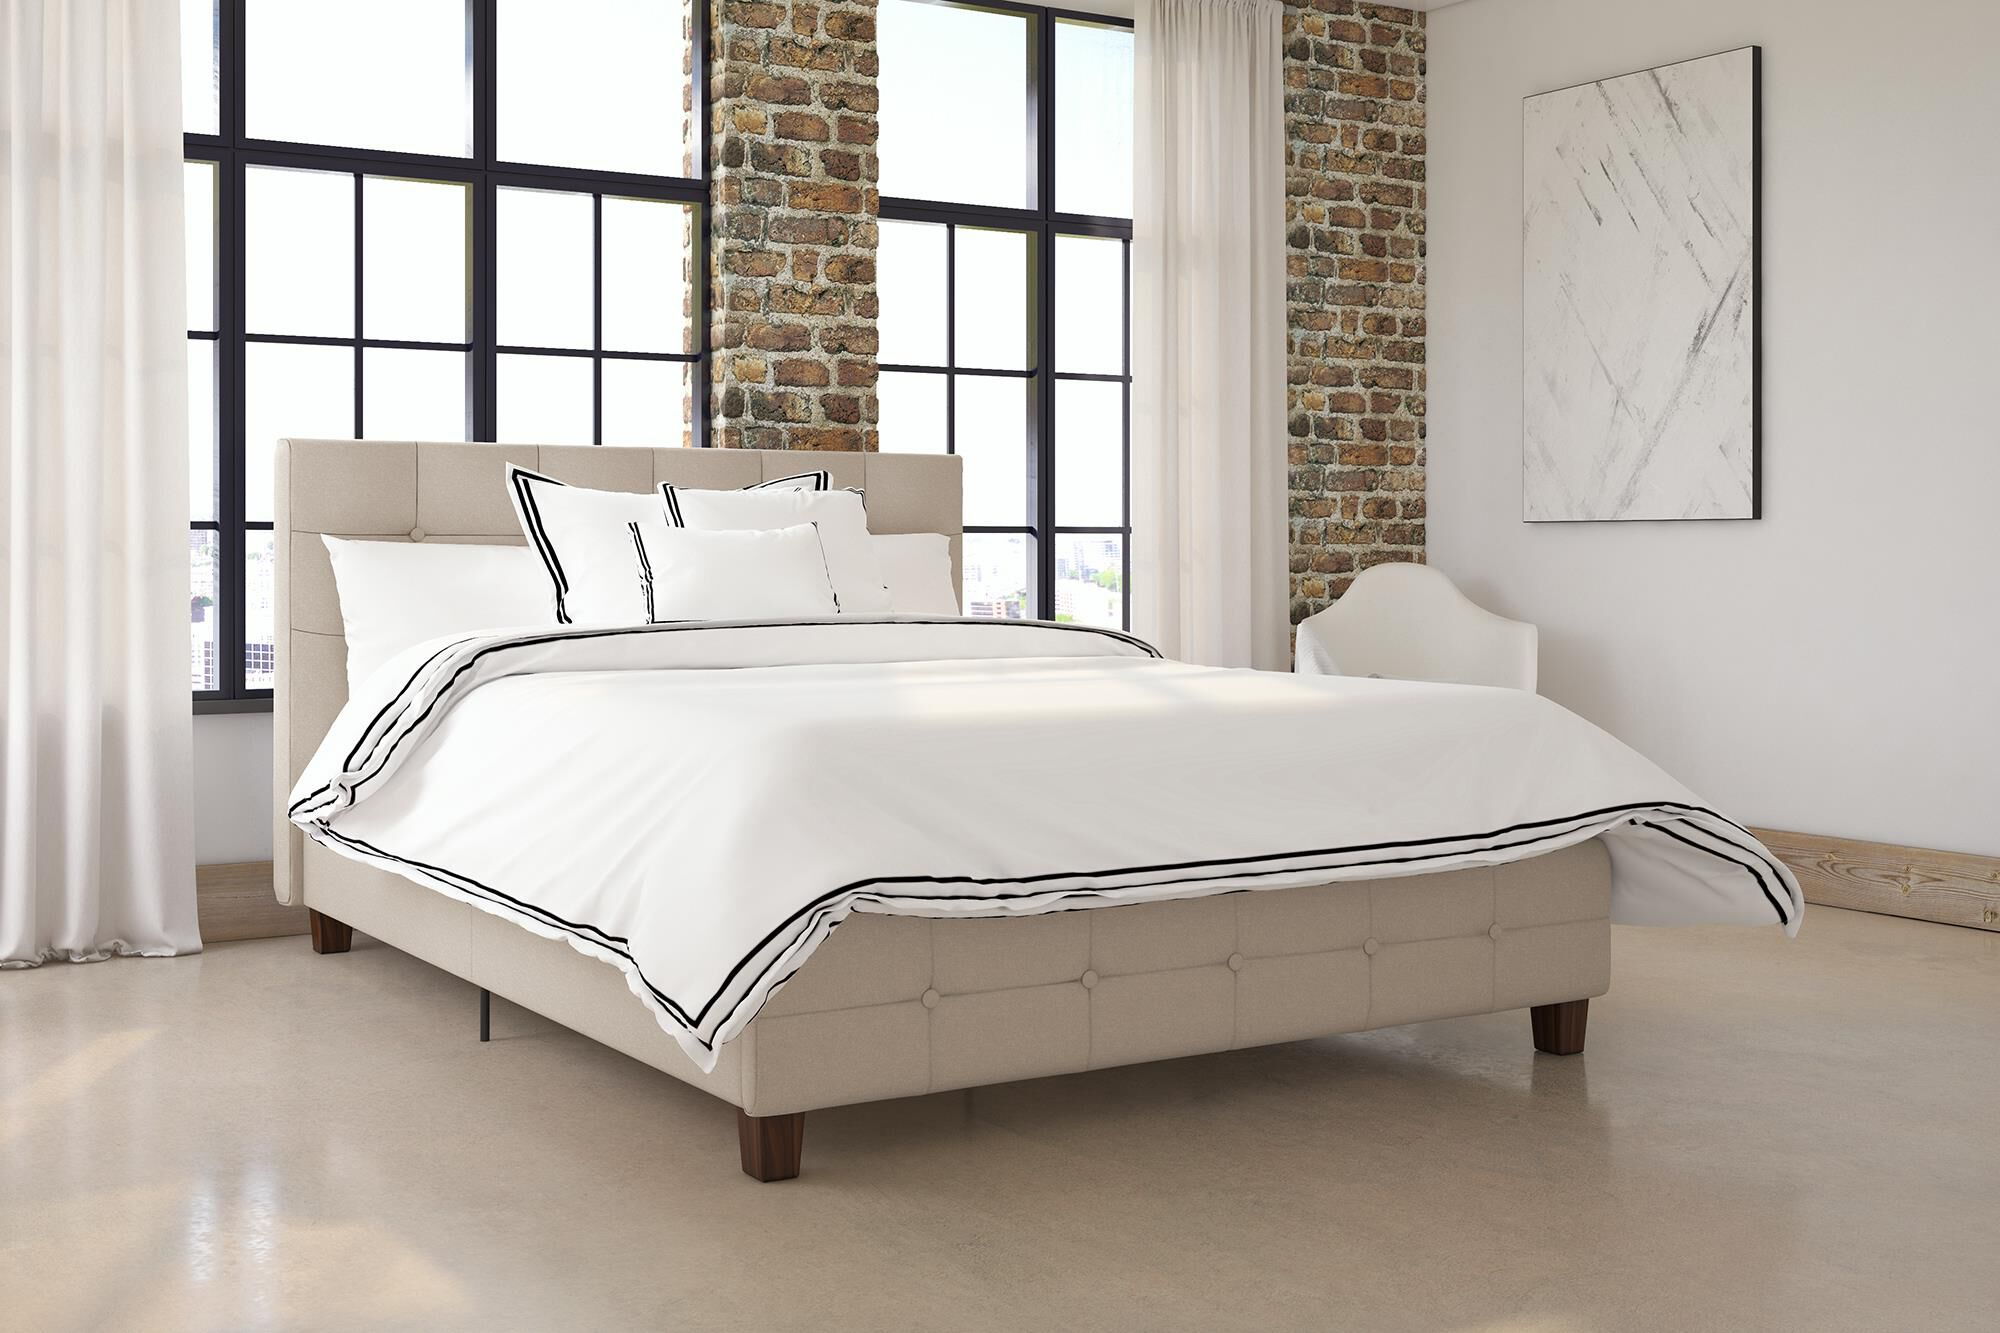 Tan Full Dhp 4028309 Rose Upholstered Bed Home Beds Frames Bases